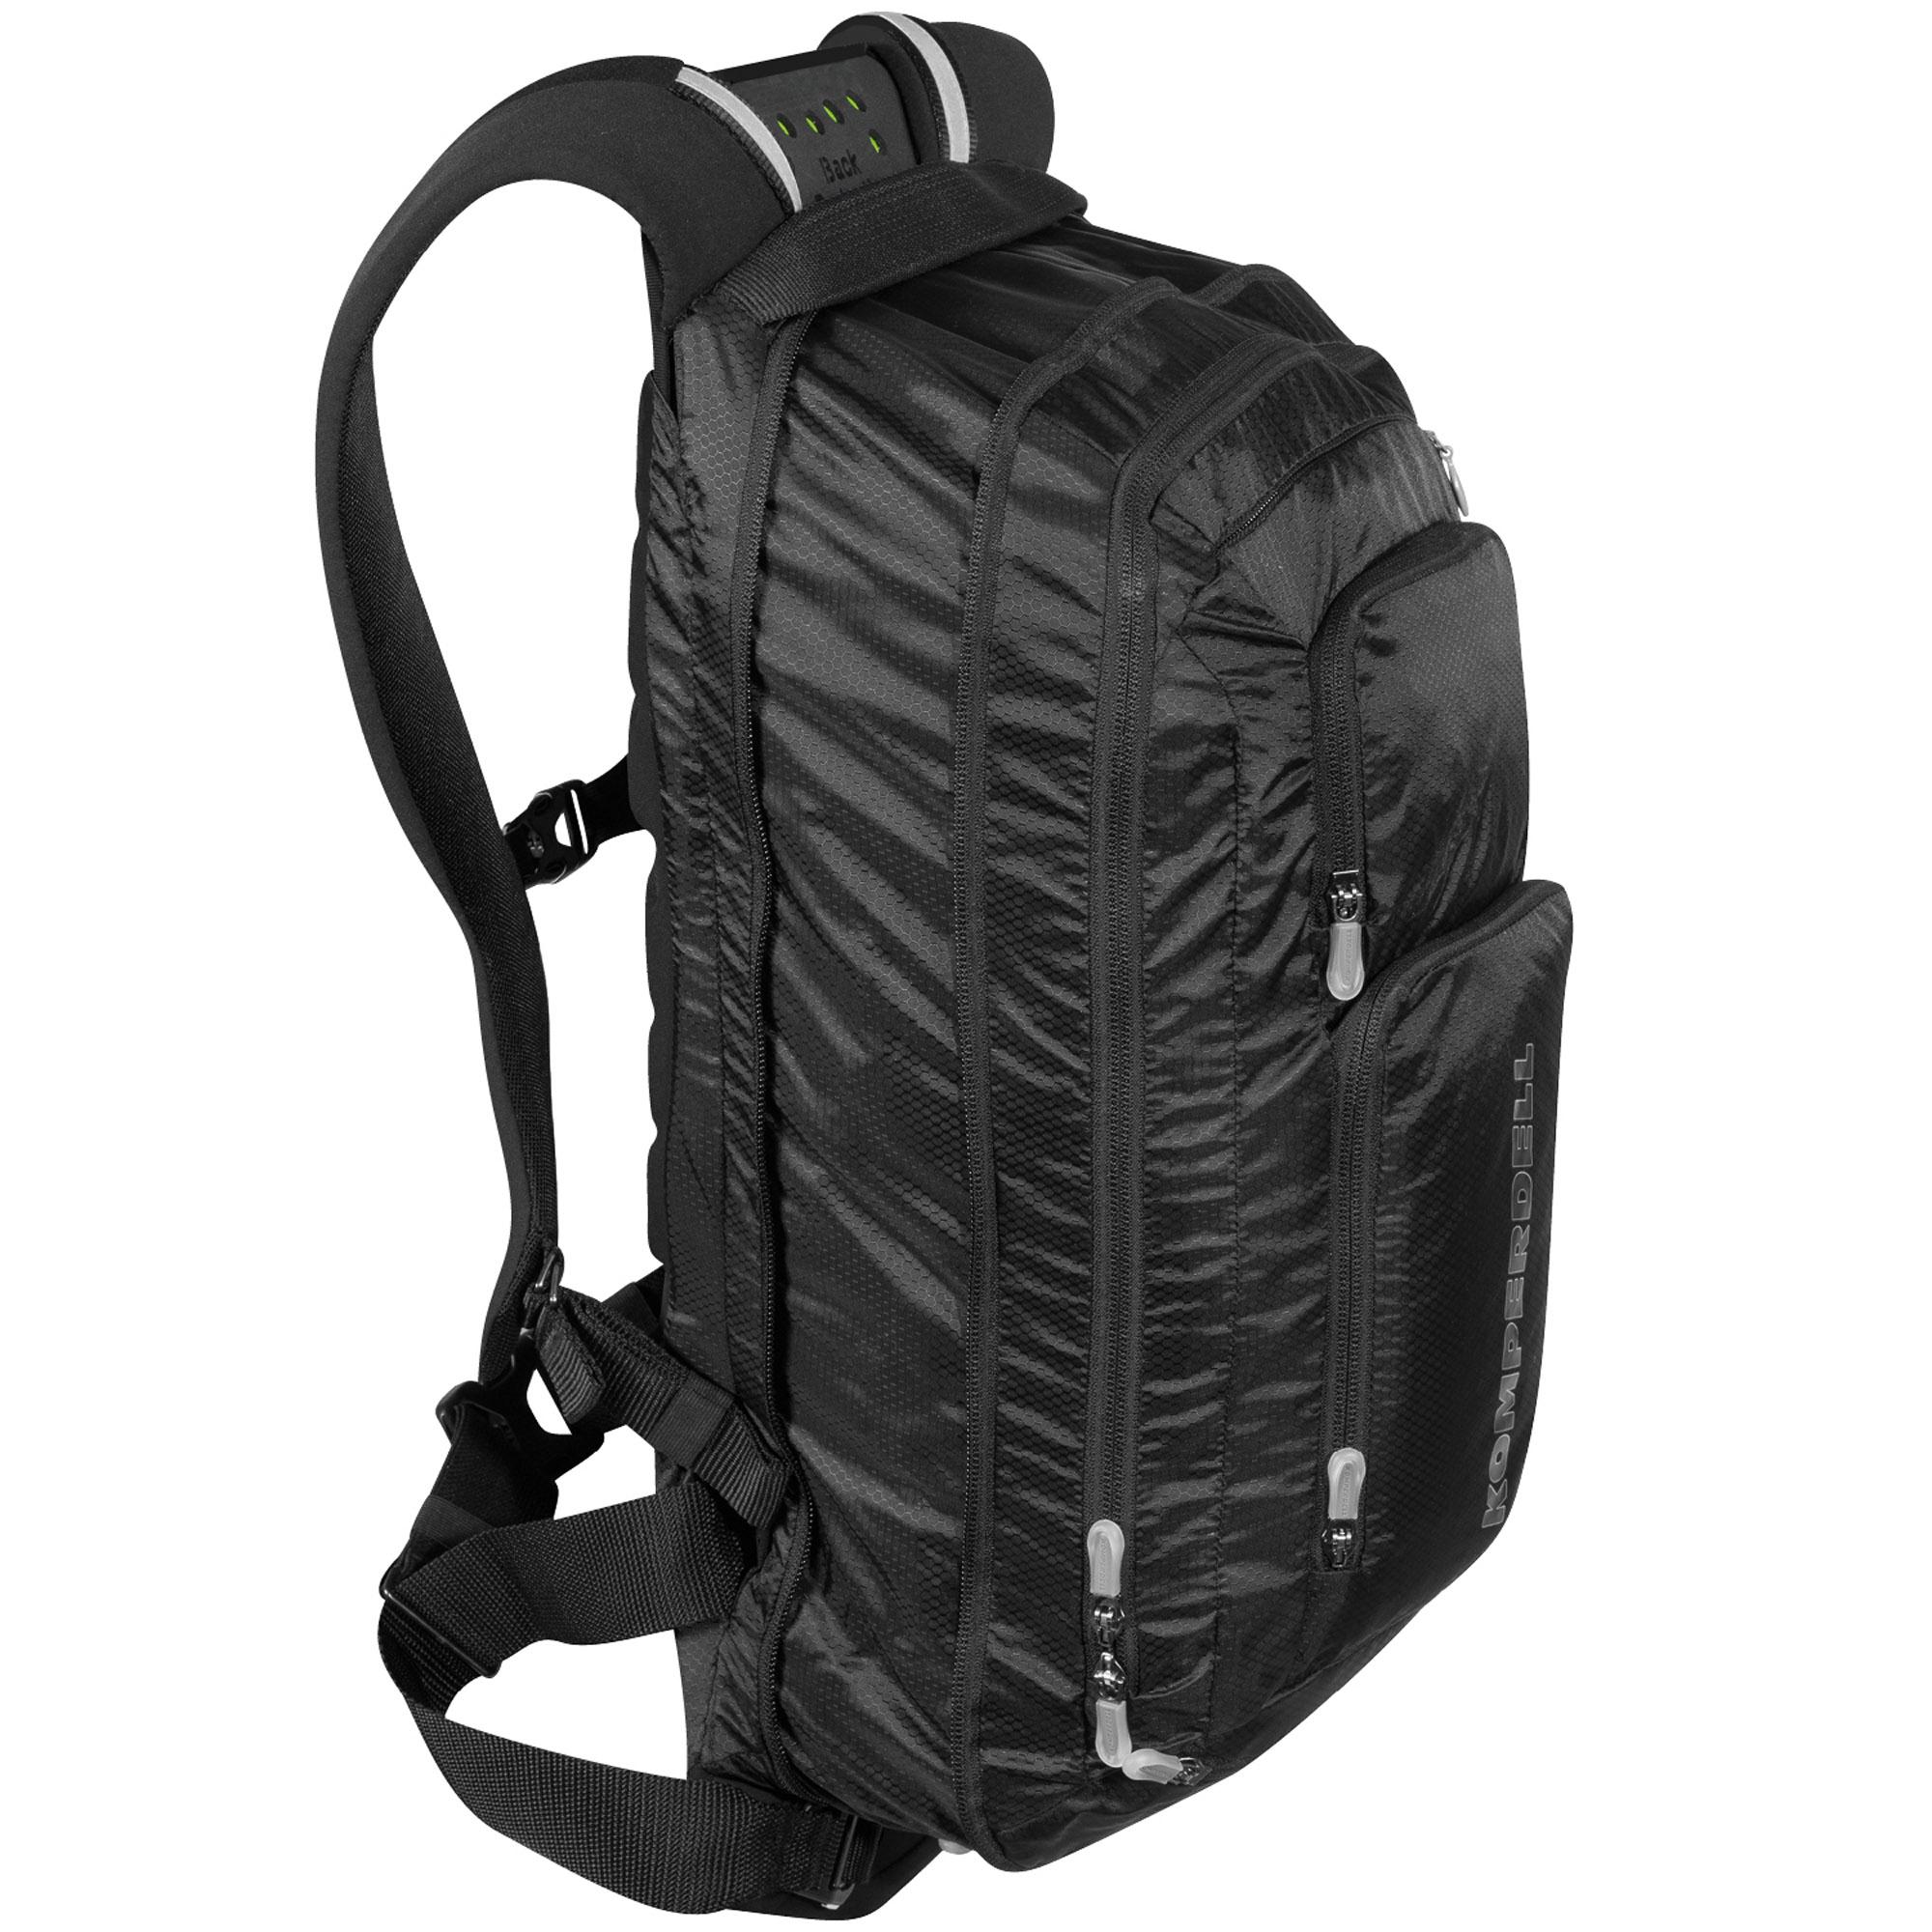 Urban Protectorpack